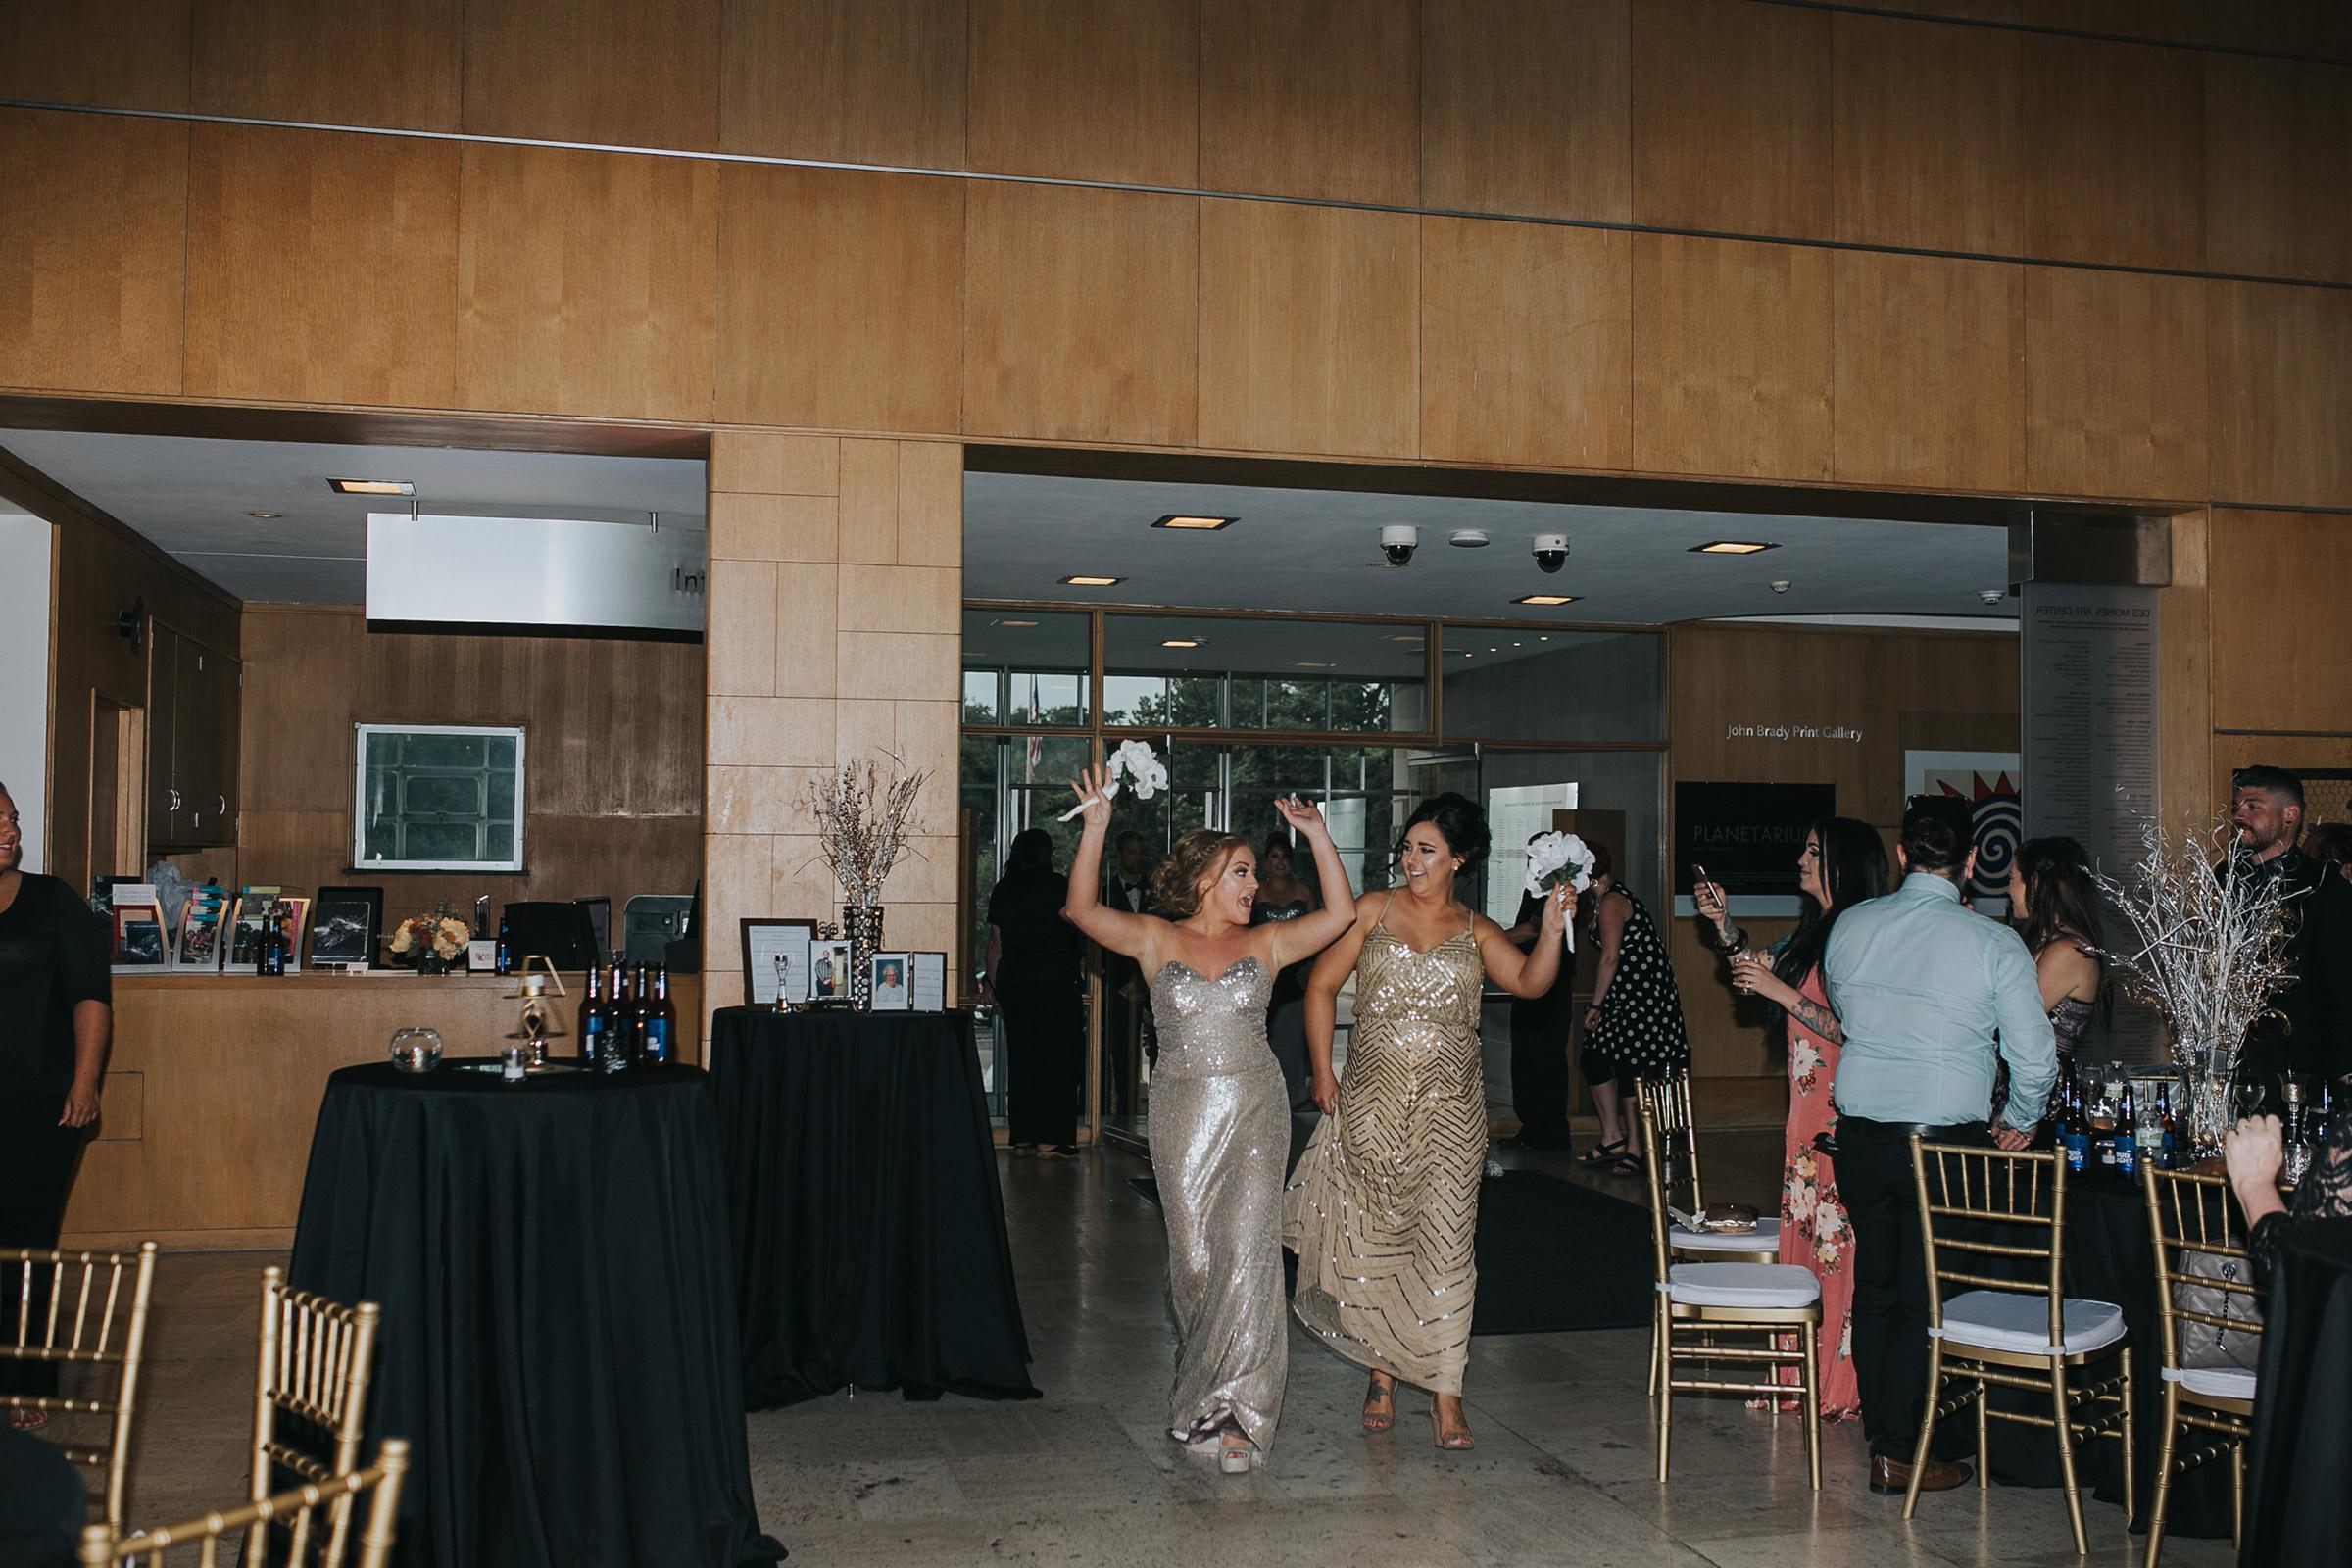 bridesmaids-skipping-grand-enterance-desmoines-iowa-art-center-raelyn-ramey-photography.jpg